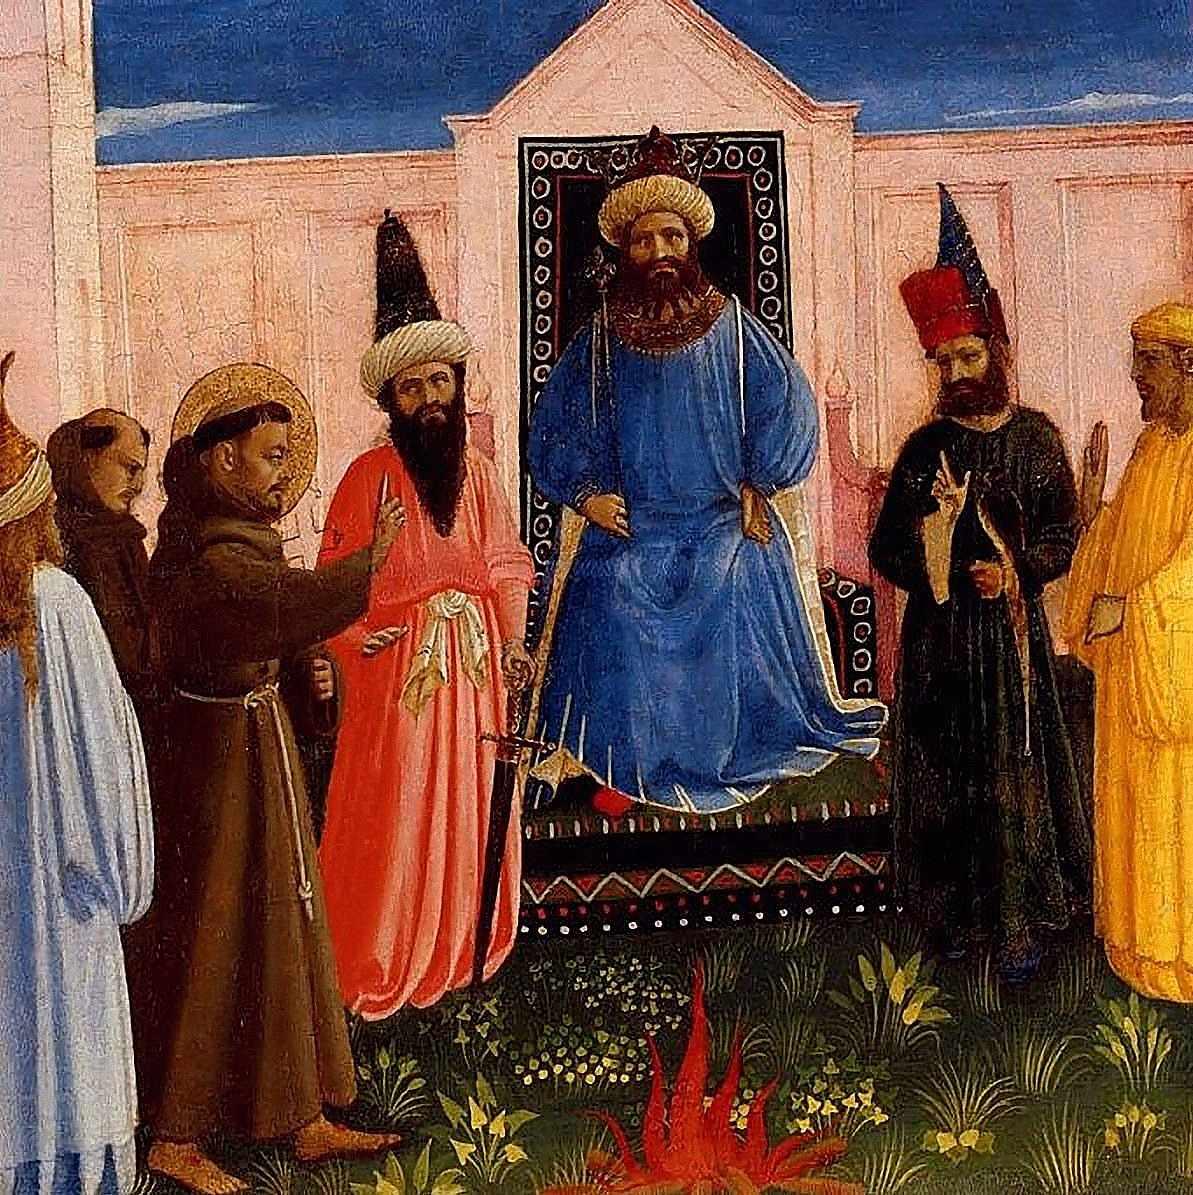 San Francisco de Asís participó de las Cruzadas  e intentó convertir al sultán de Egipto Bal-Malik Bal-Kamil. Fra Angelico, Lindenau Museum, Altenberg.